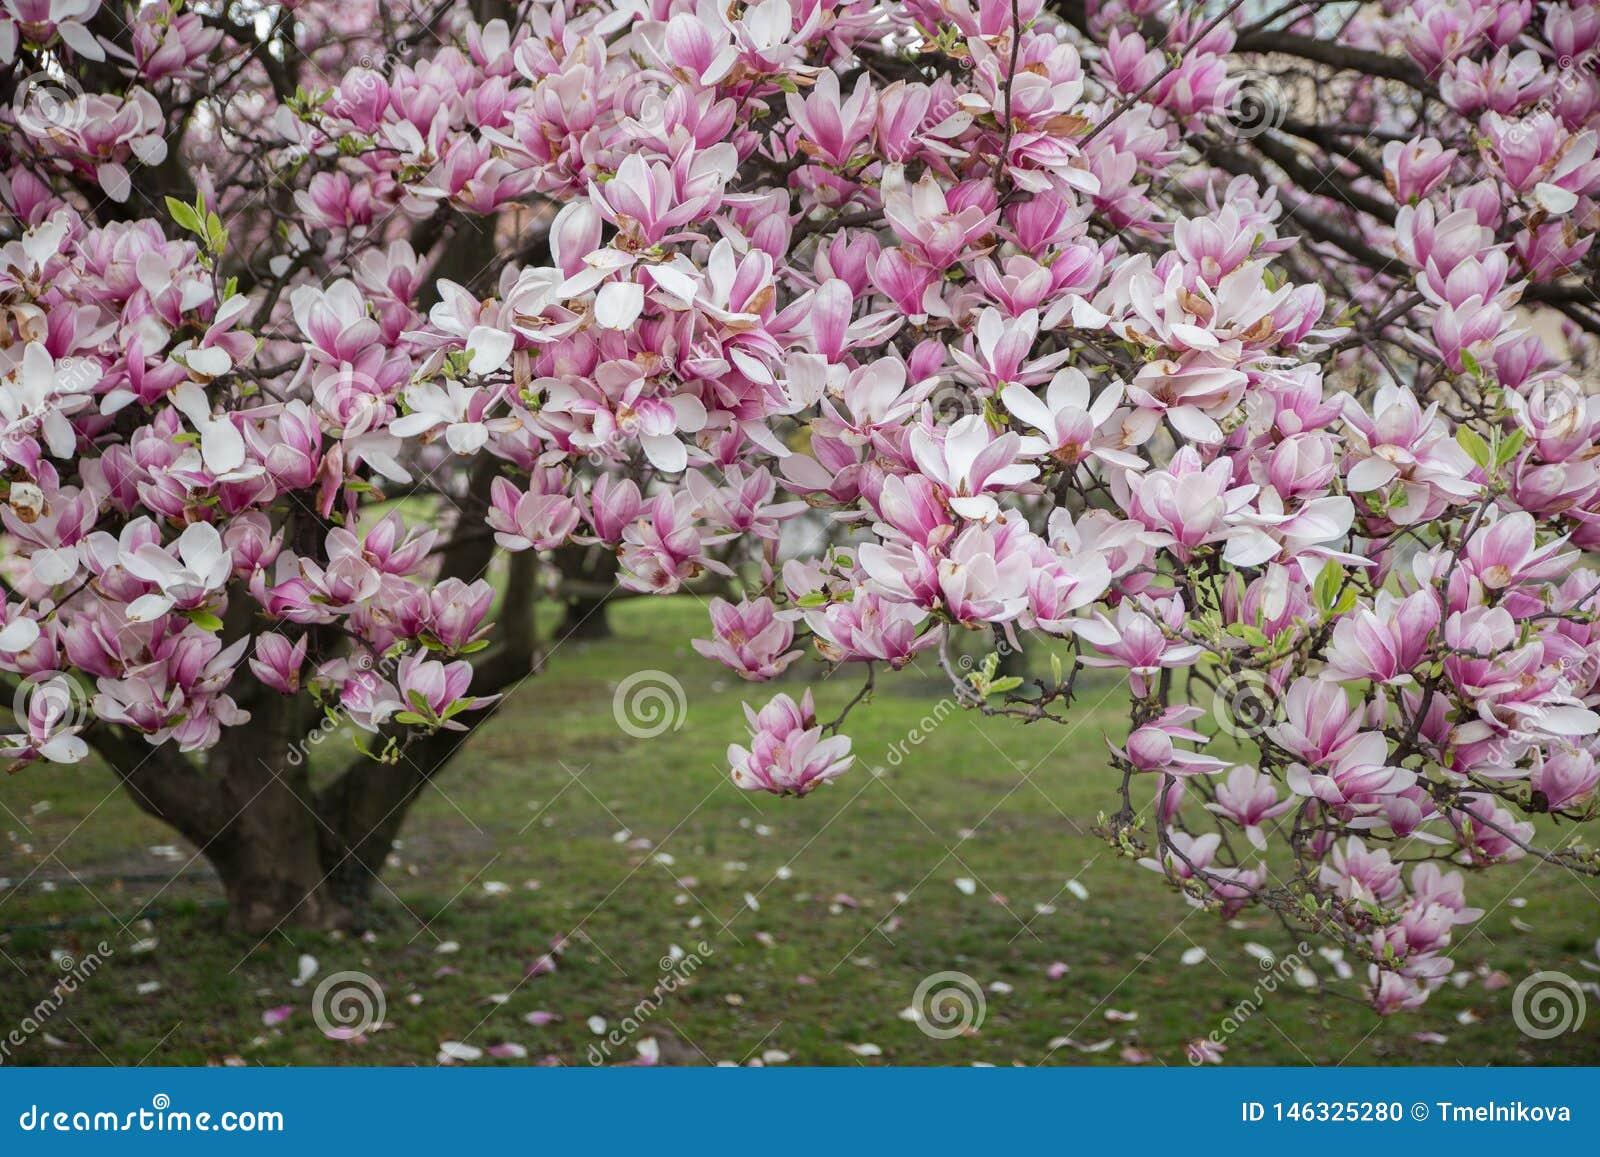 Flowering Magnolia Tulip Tree Pink Magnolias In Spring Day Stock